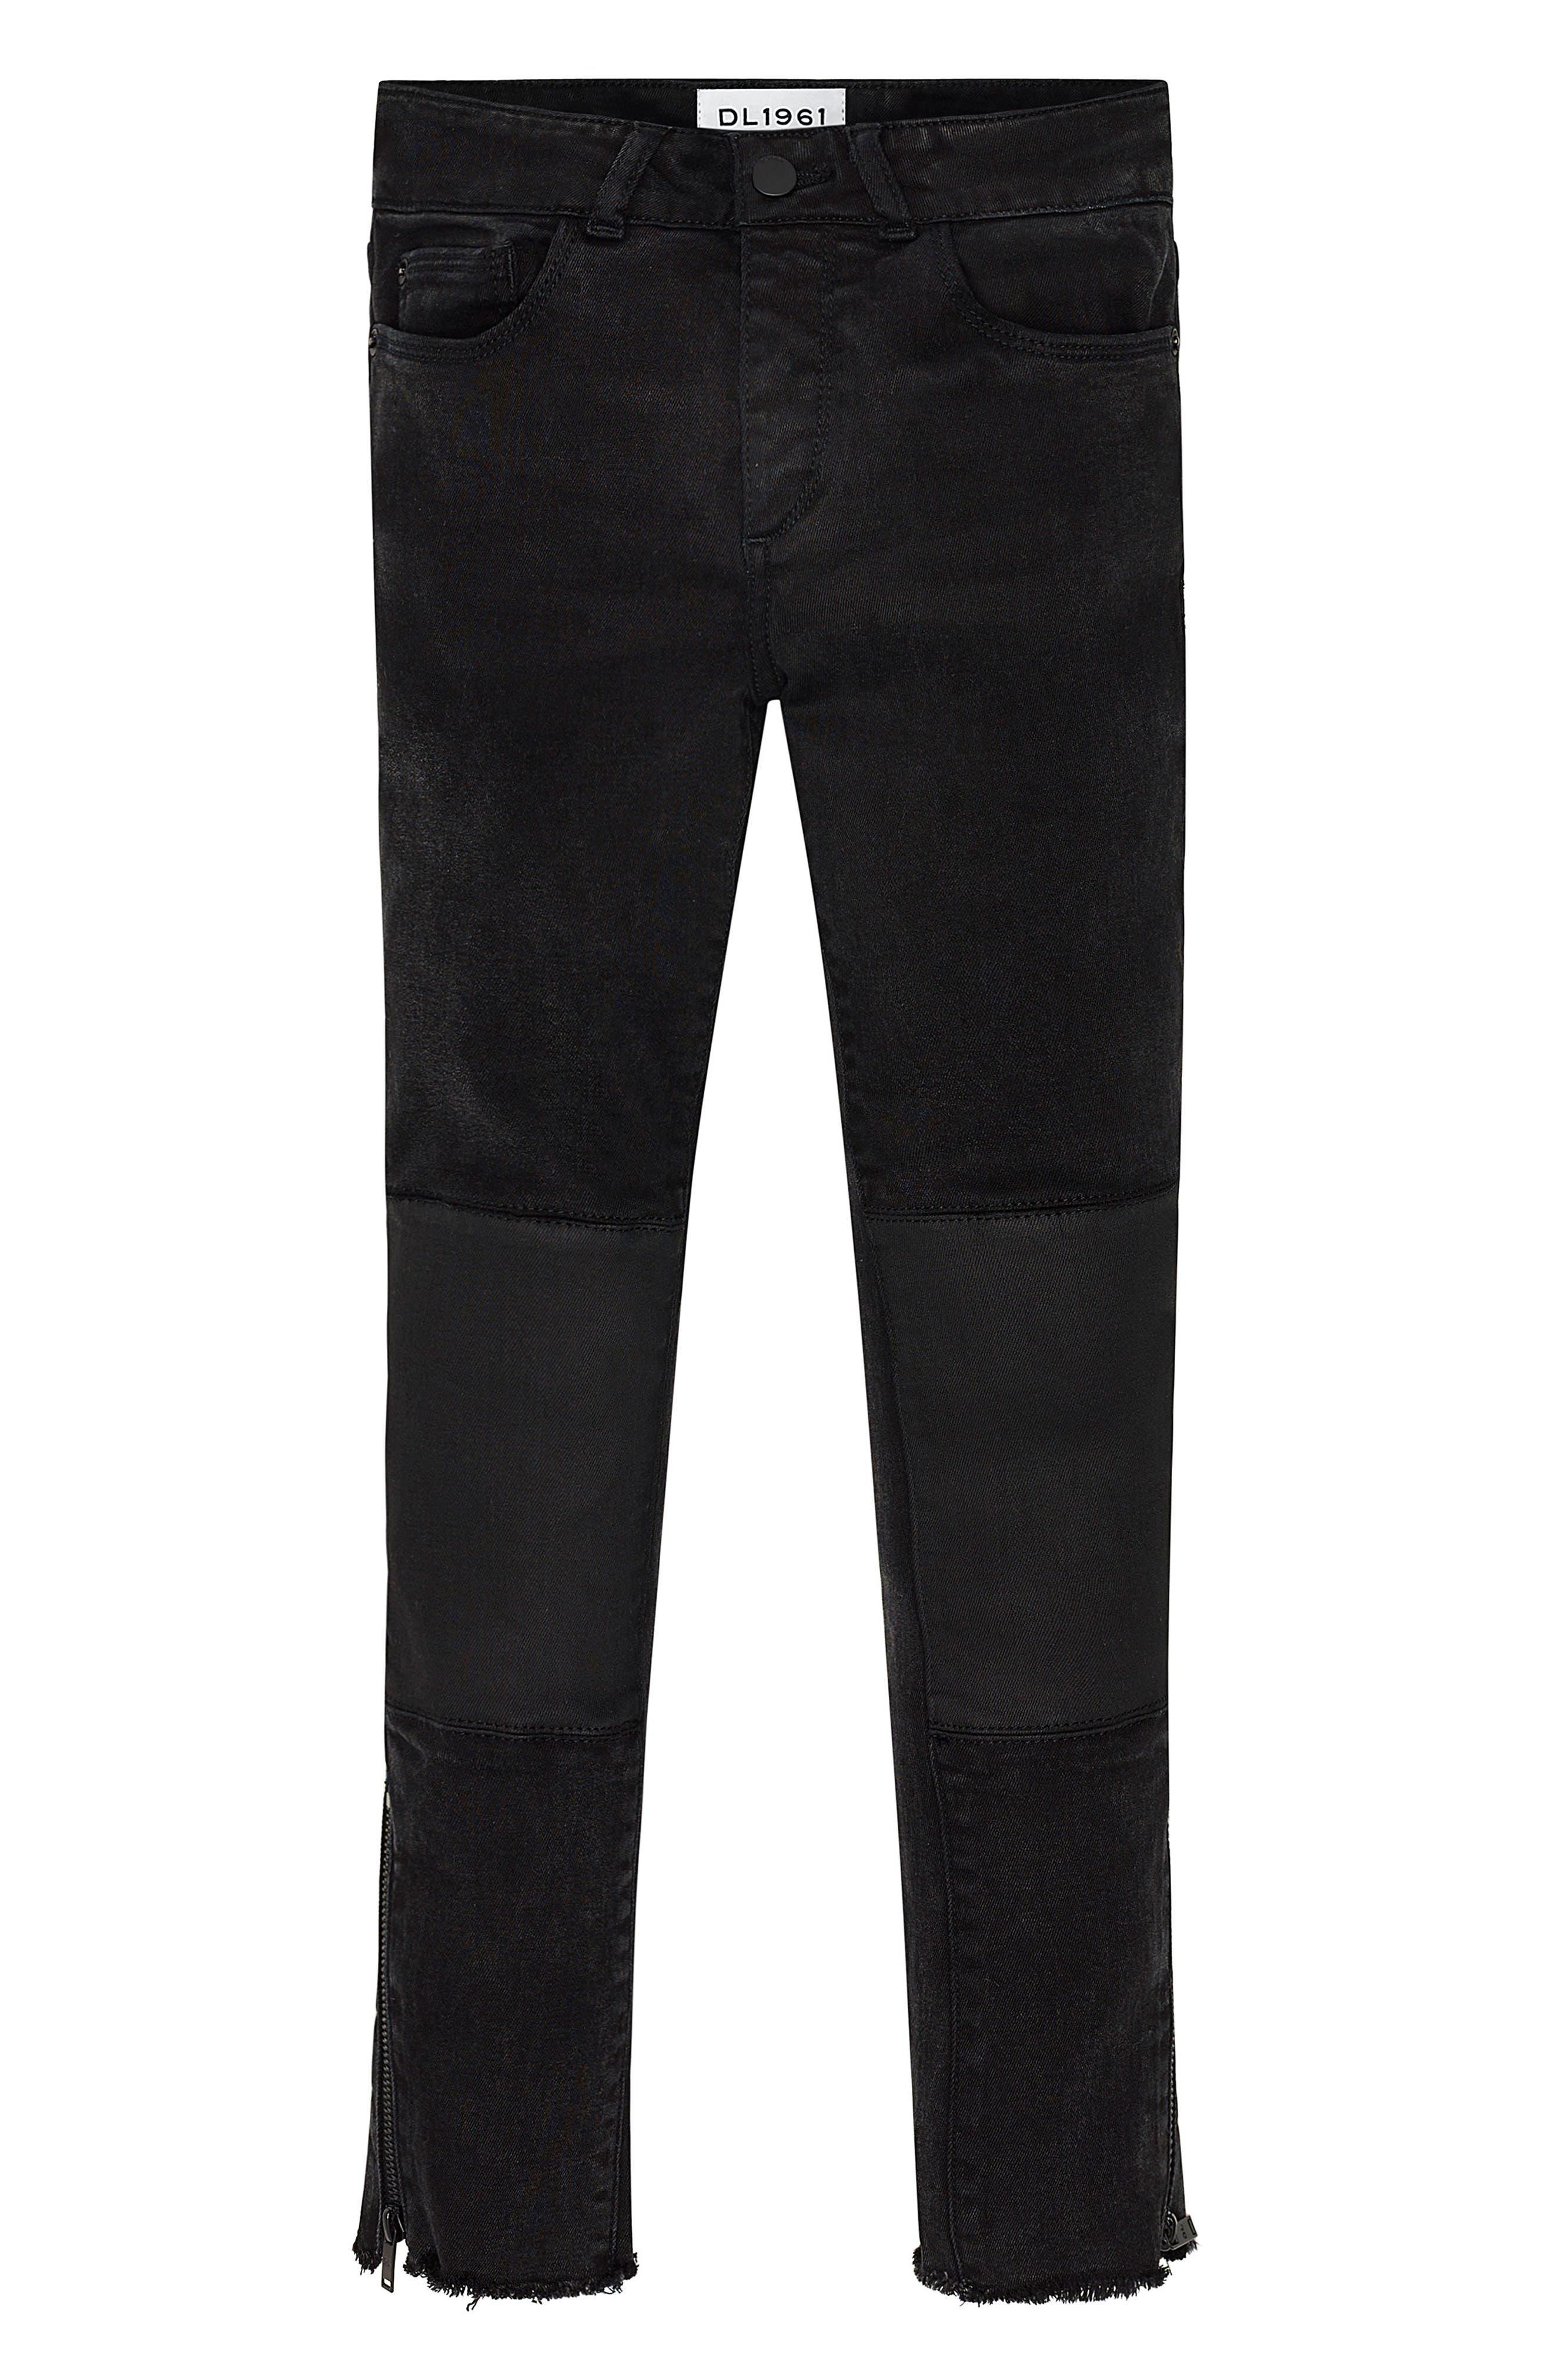 Chloe Moto Skinny Jeans,                         Main,                         color, Roxanne